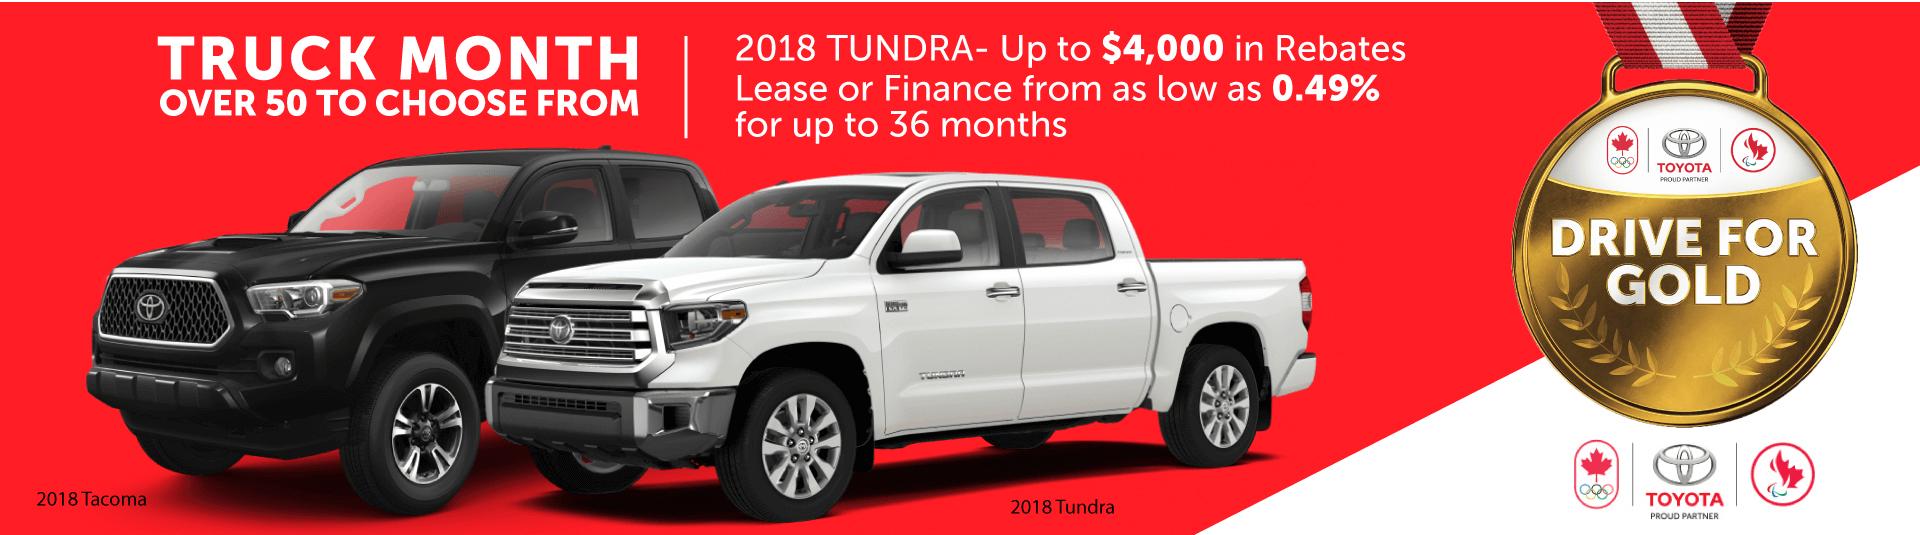 2028 Toyota Tundra Sales